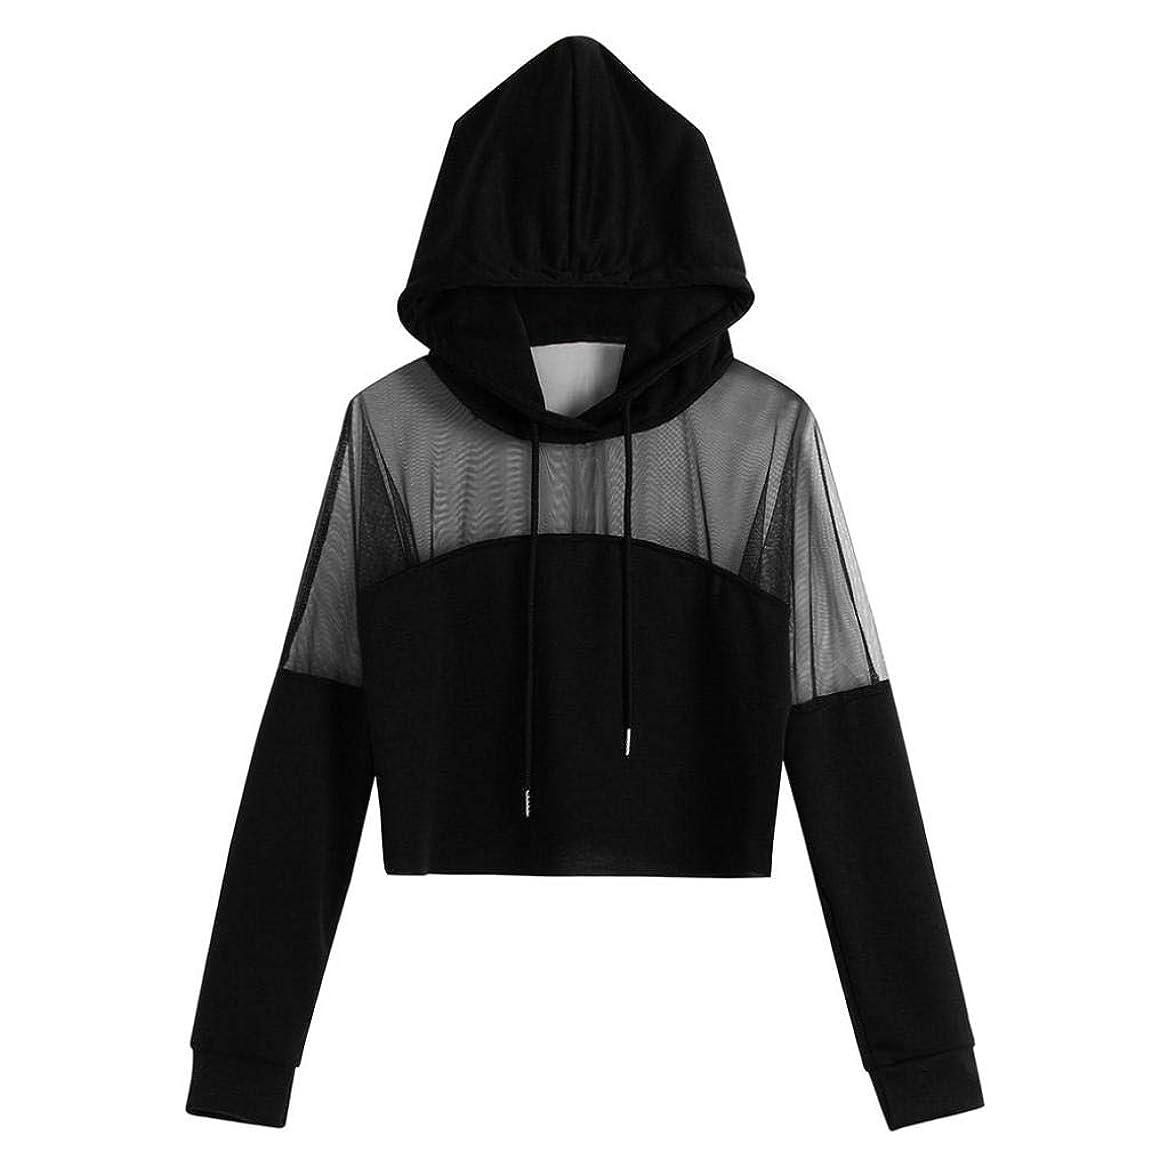 Women Transparent Sport Sweater Long Sleeves Cropped Hoodies Blouse Shirts Top Hooded Shirts Hemlock